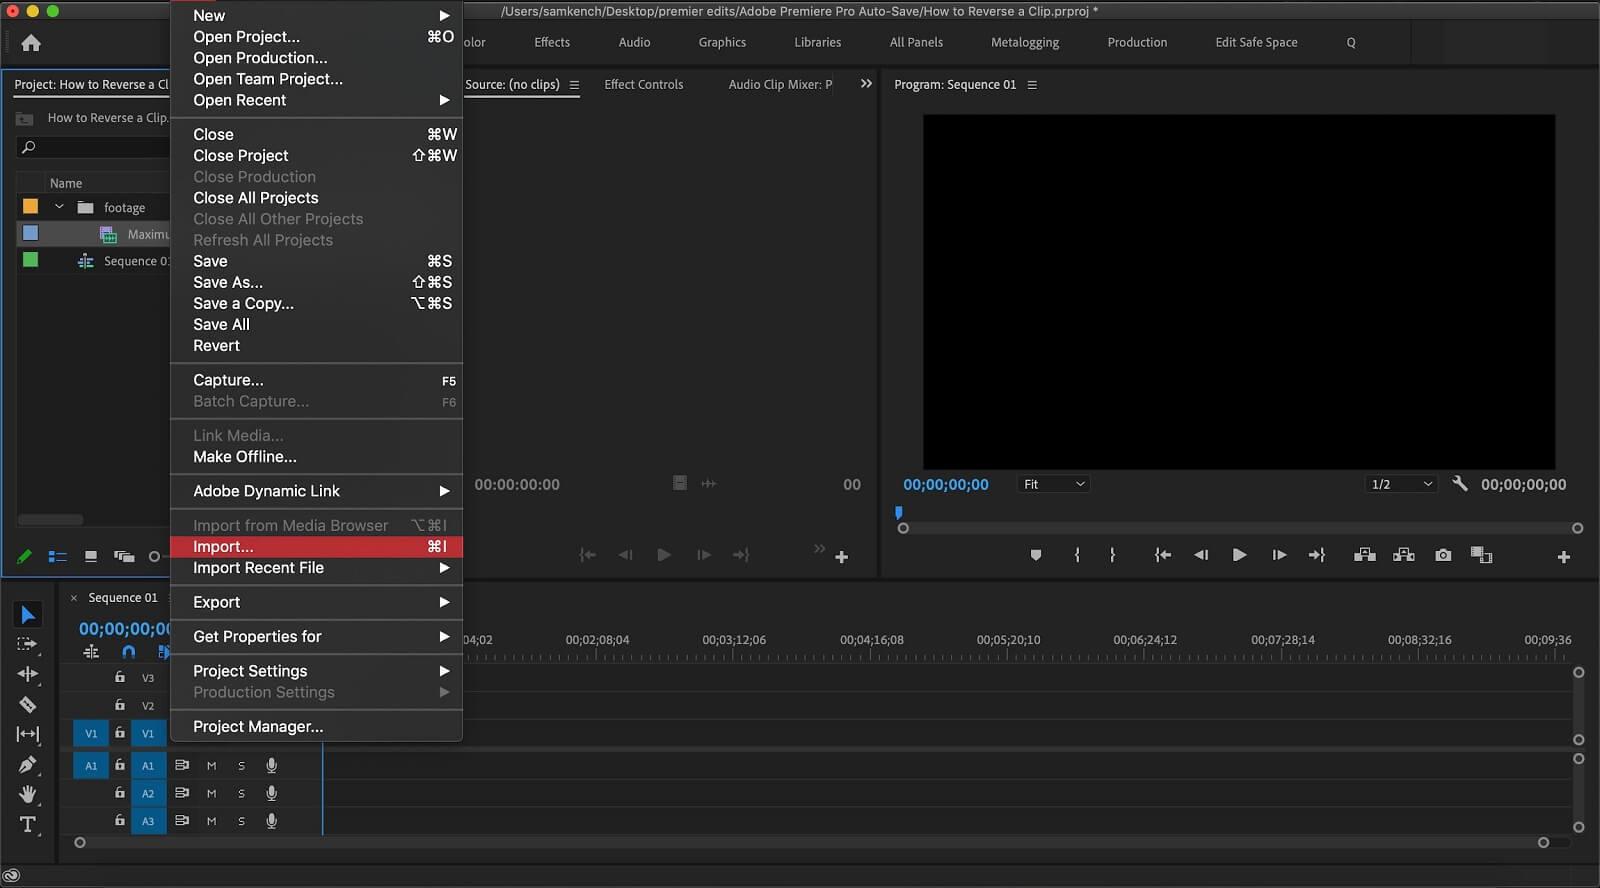 How To Reverse a Clip im Premiere Pro - Reverse Video in Premiere